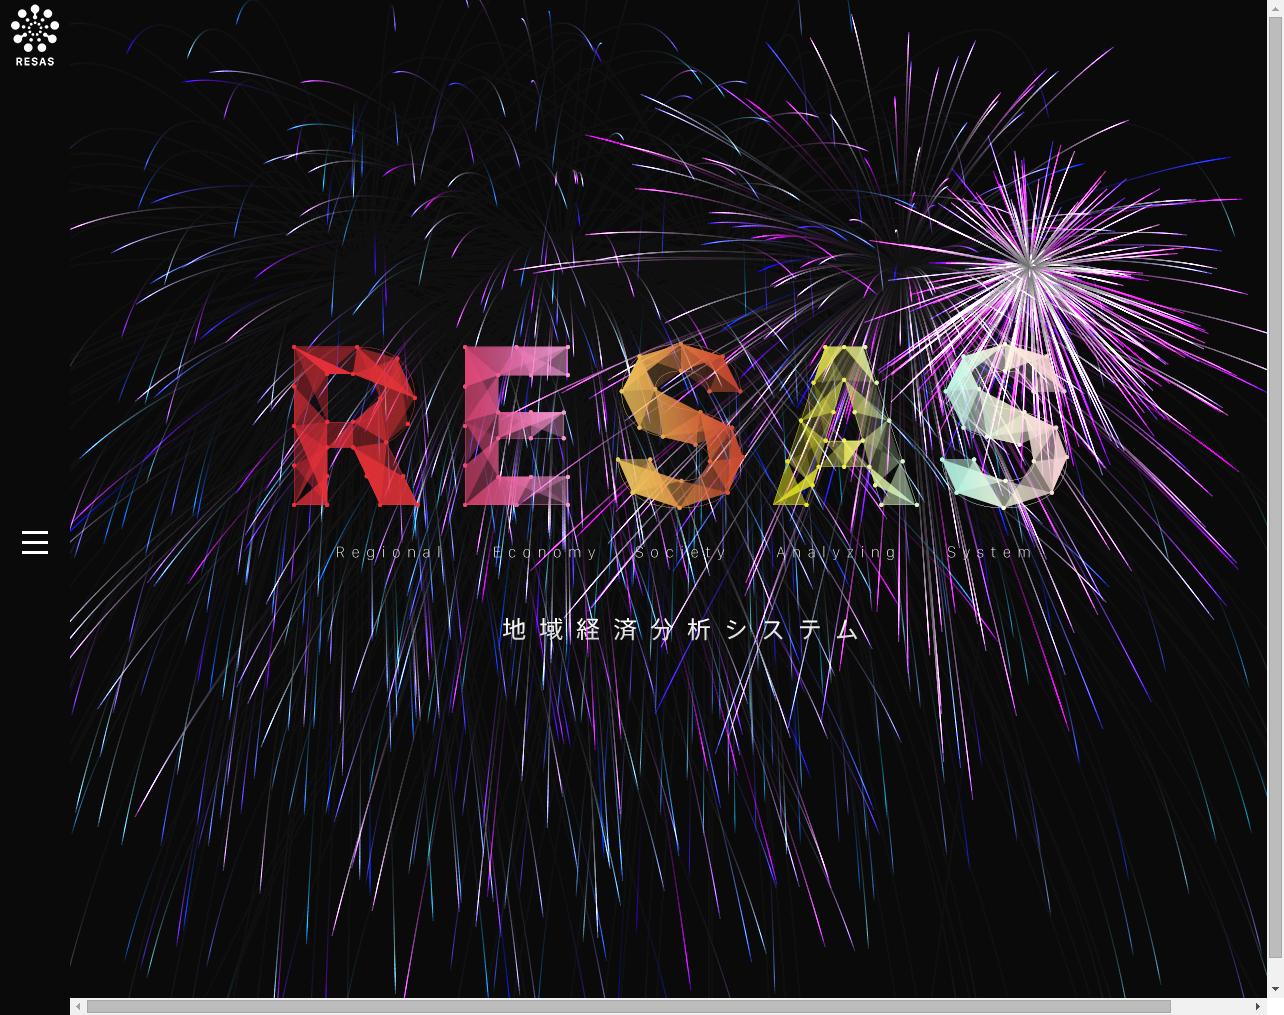 「RESAS」トップページ